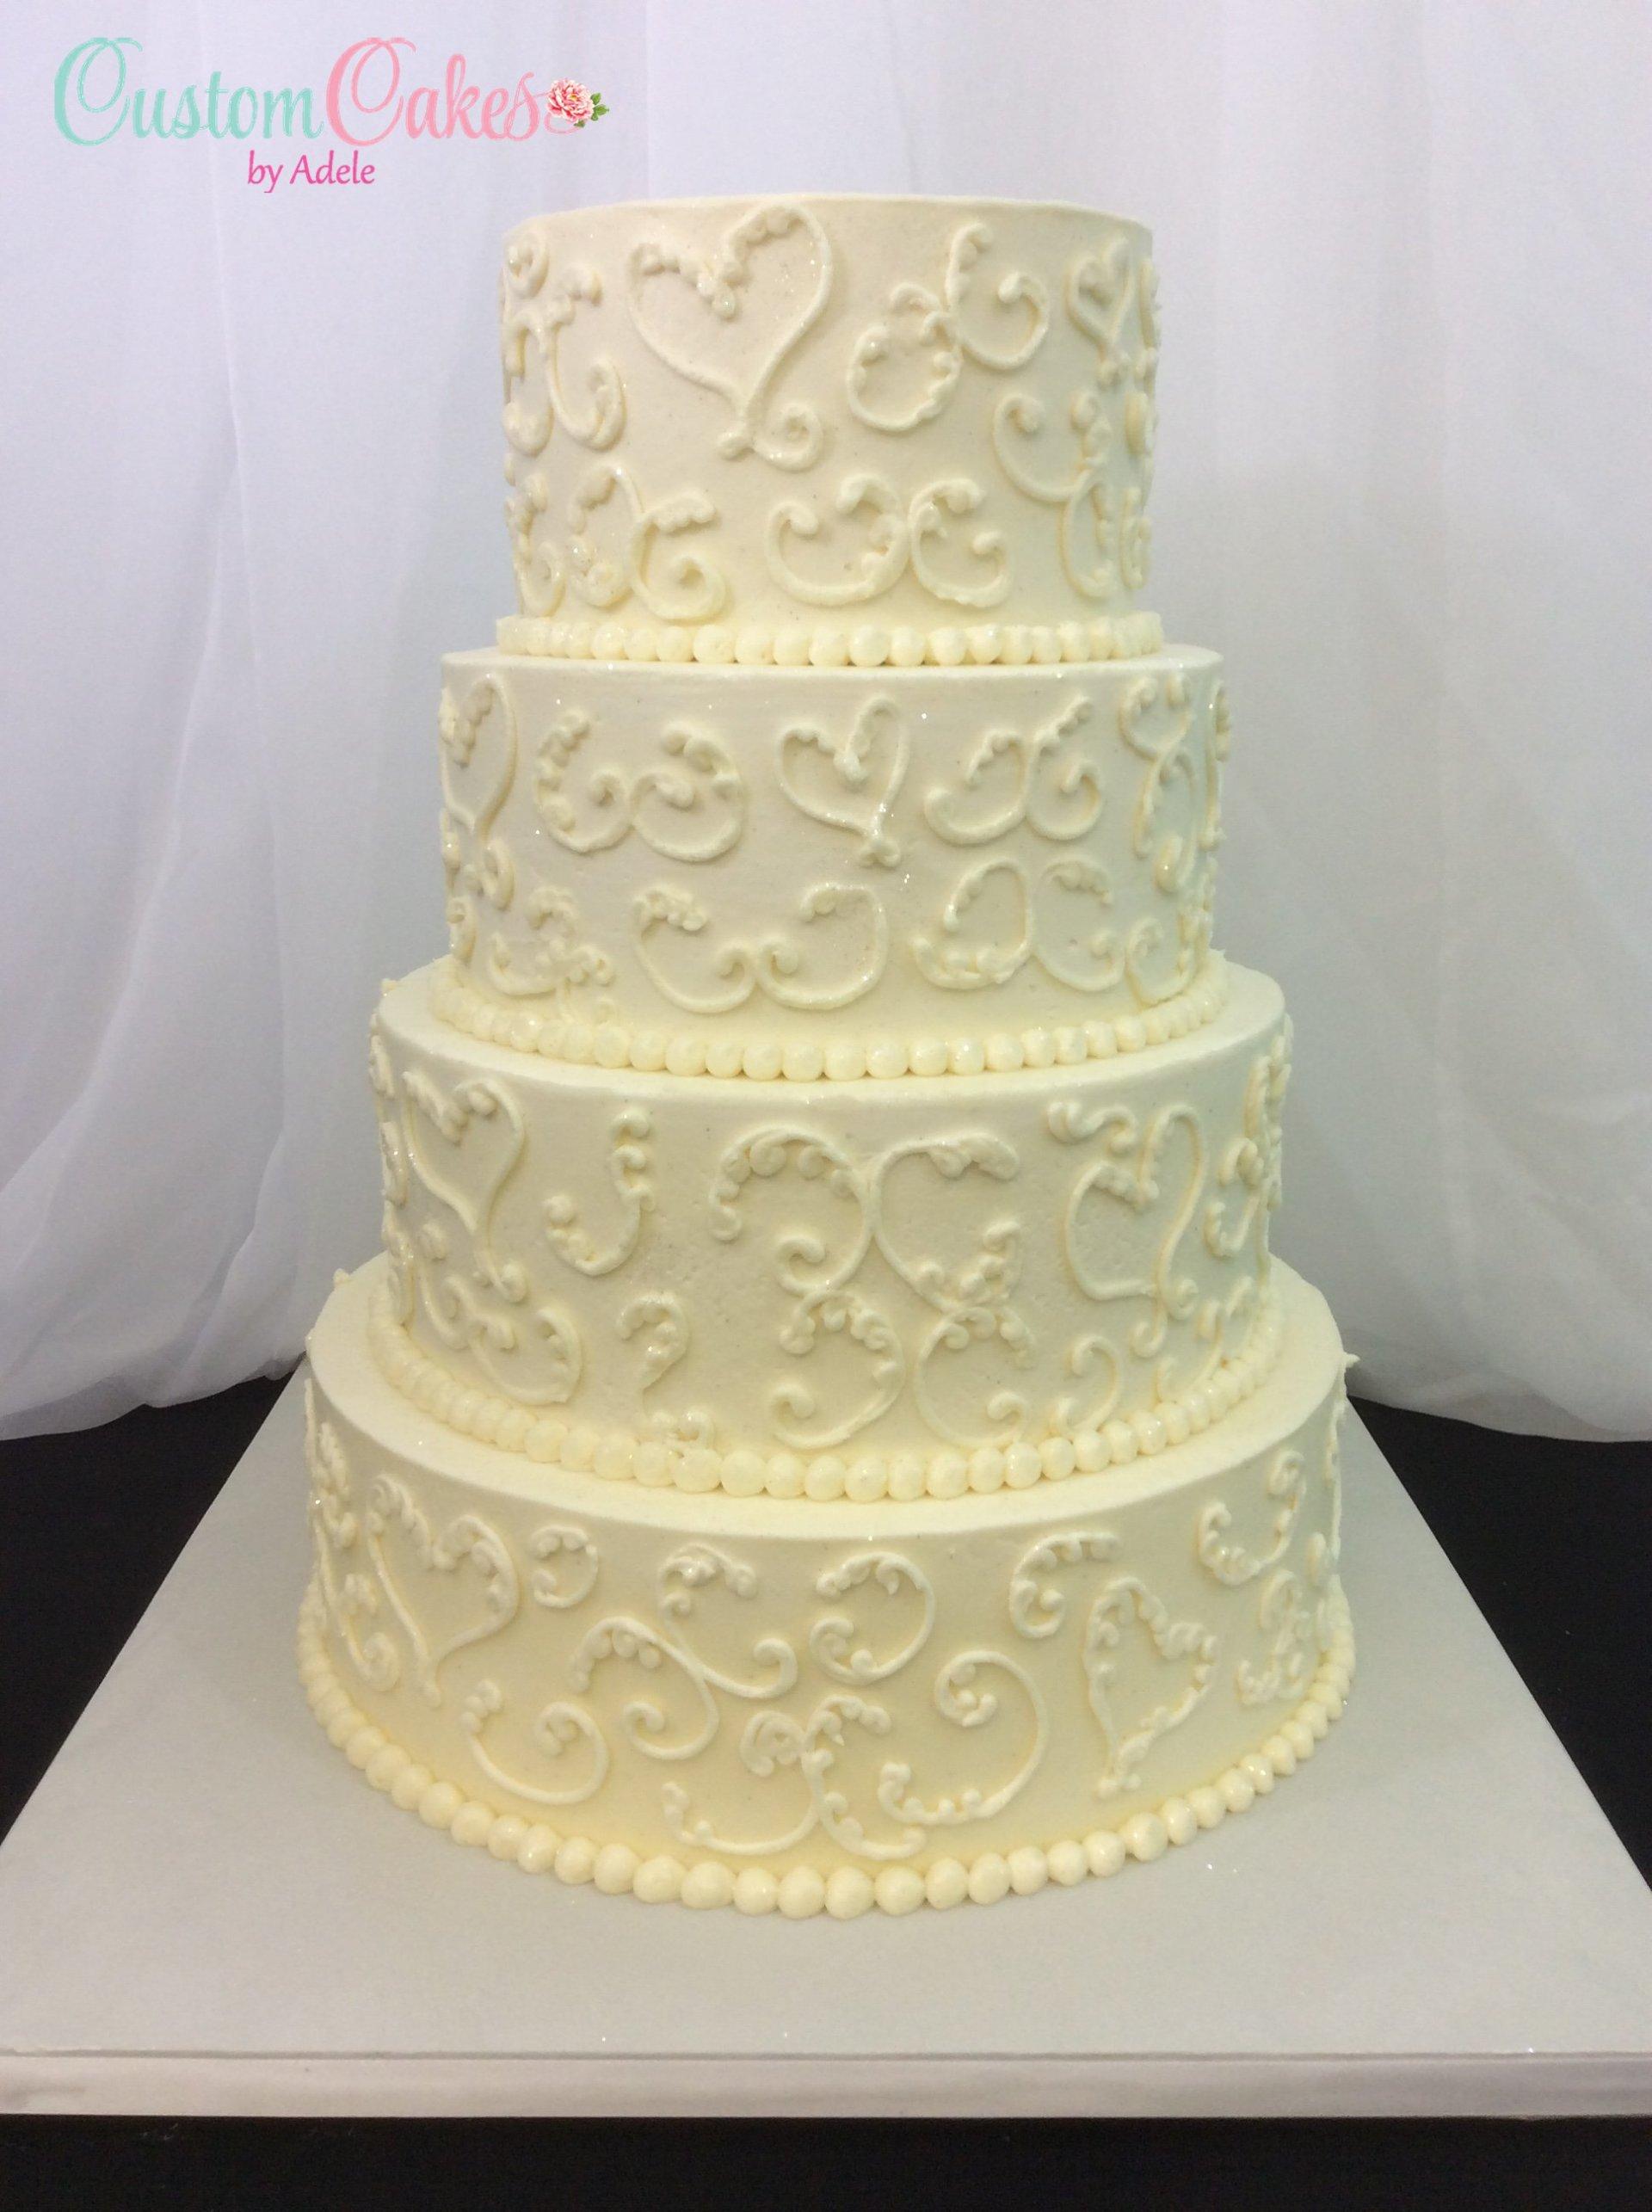 Wedding Cakes | Bridal Cakes | Whitehall, PA